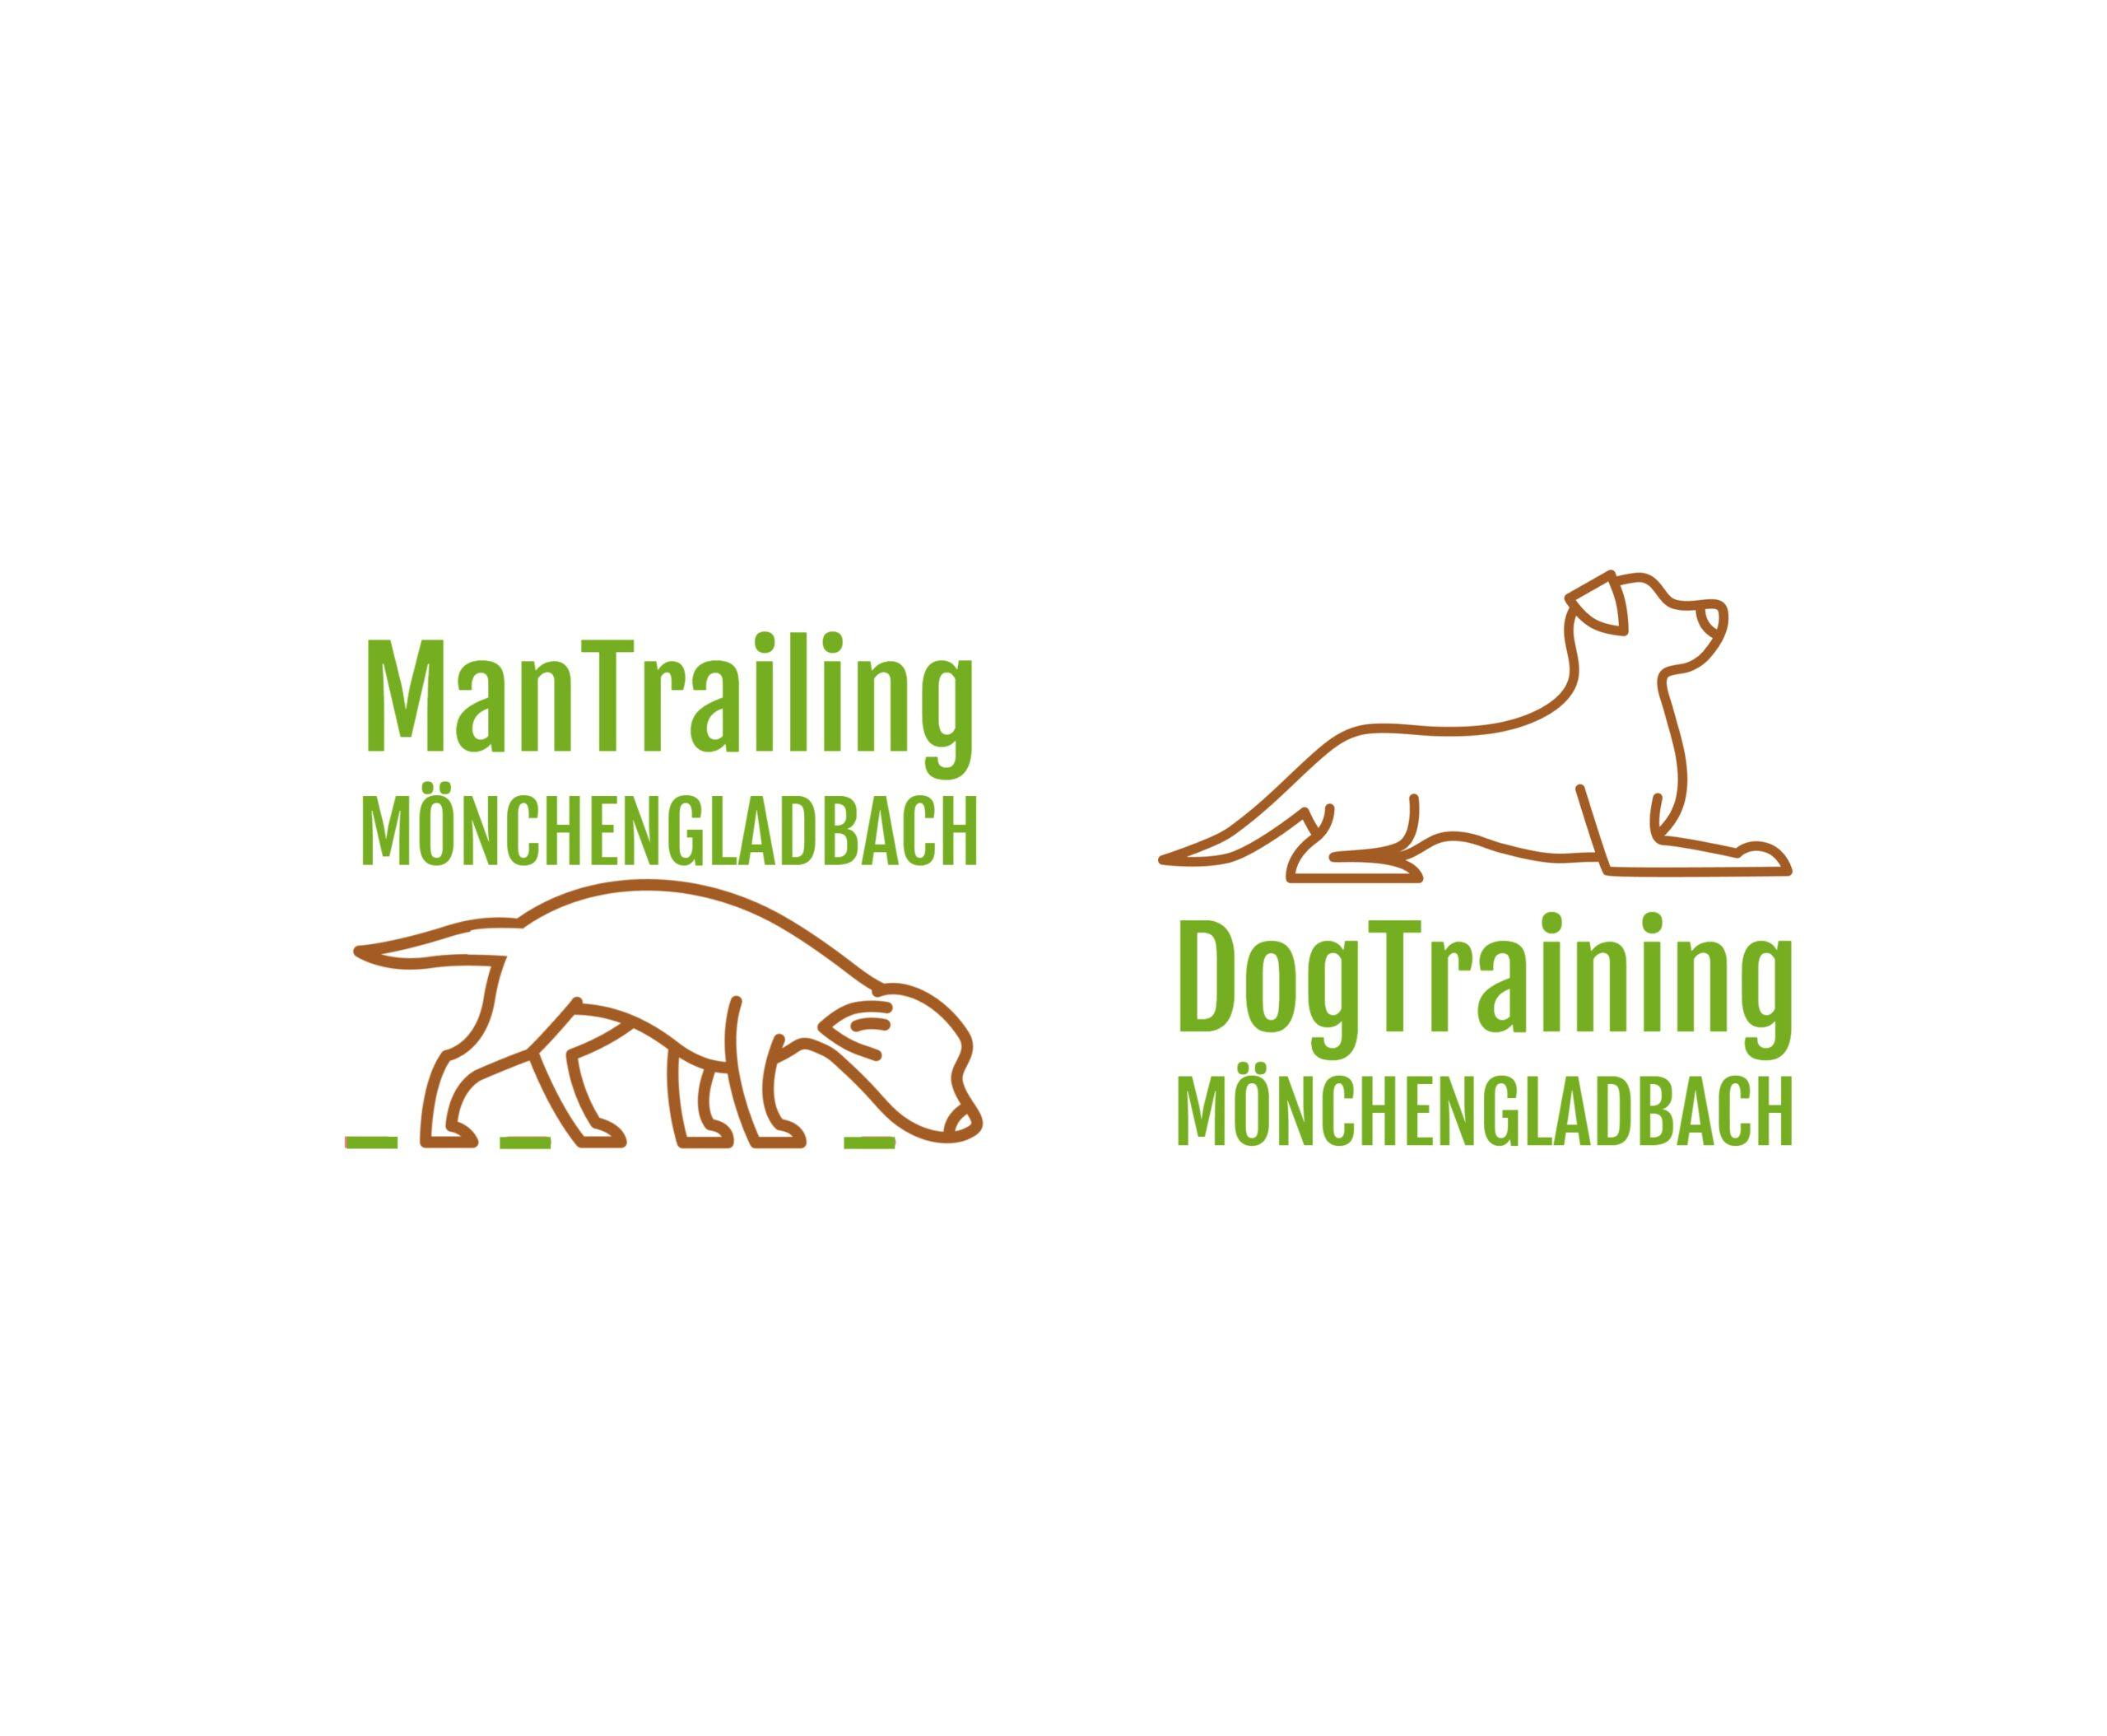 Mantrailing & DogTraining Mönchengladbach